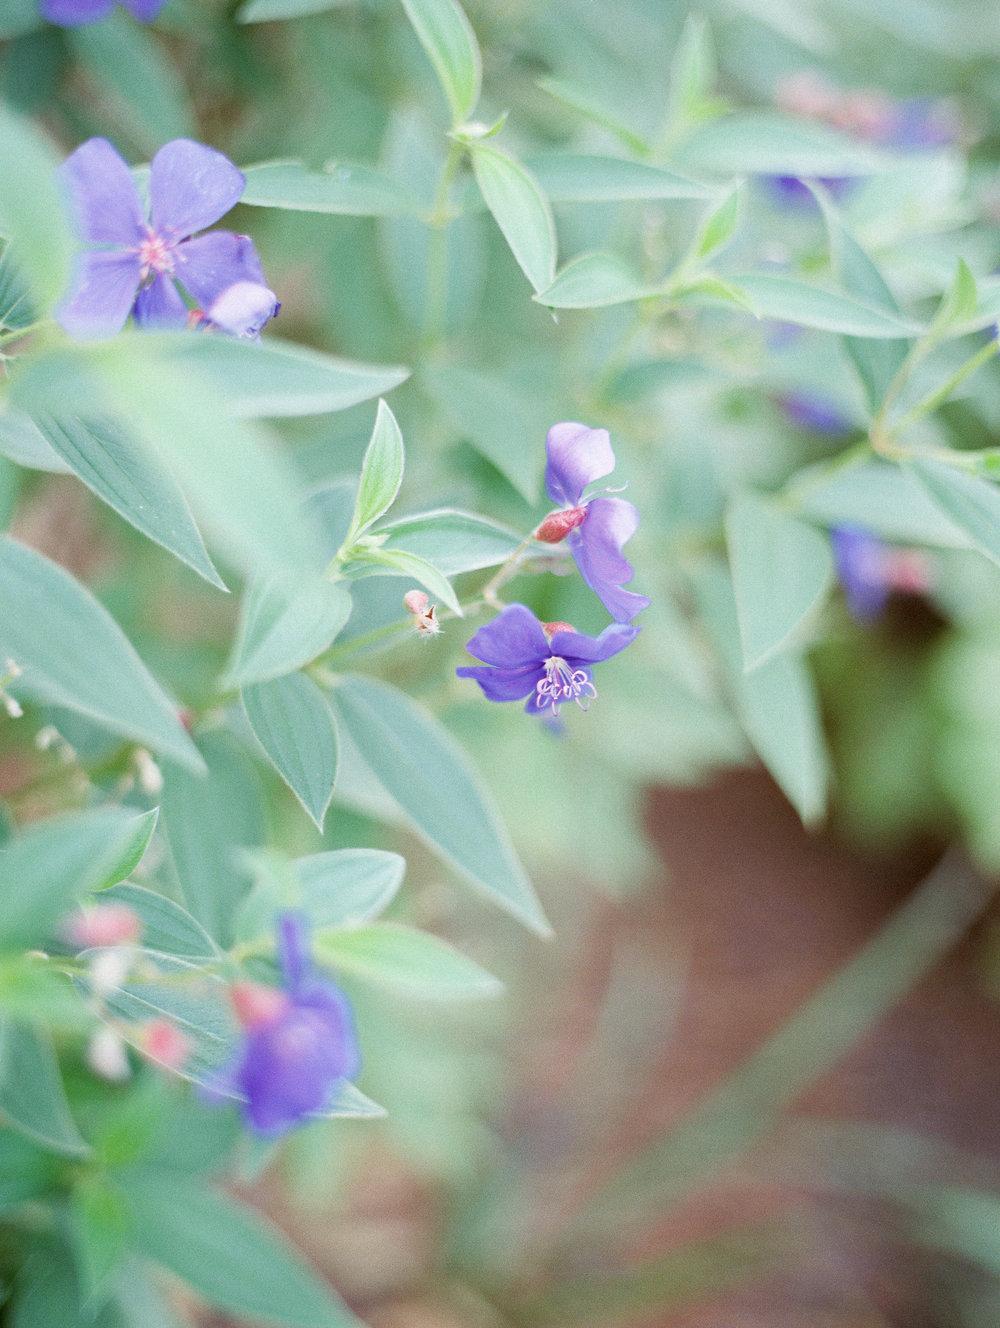 Weaver_Family_Botanical_Gardens_Columbus_Georgia_Fallen_Photography-107.JPG